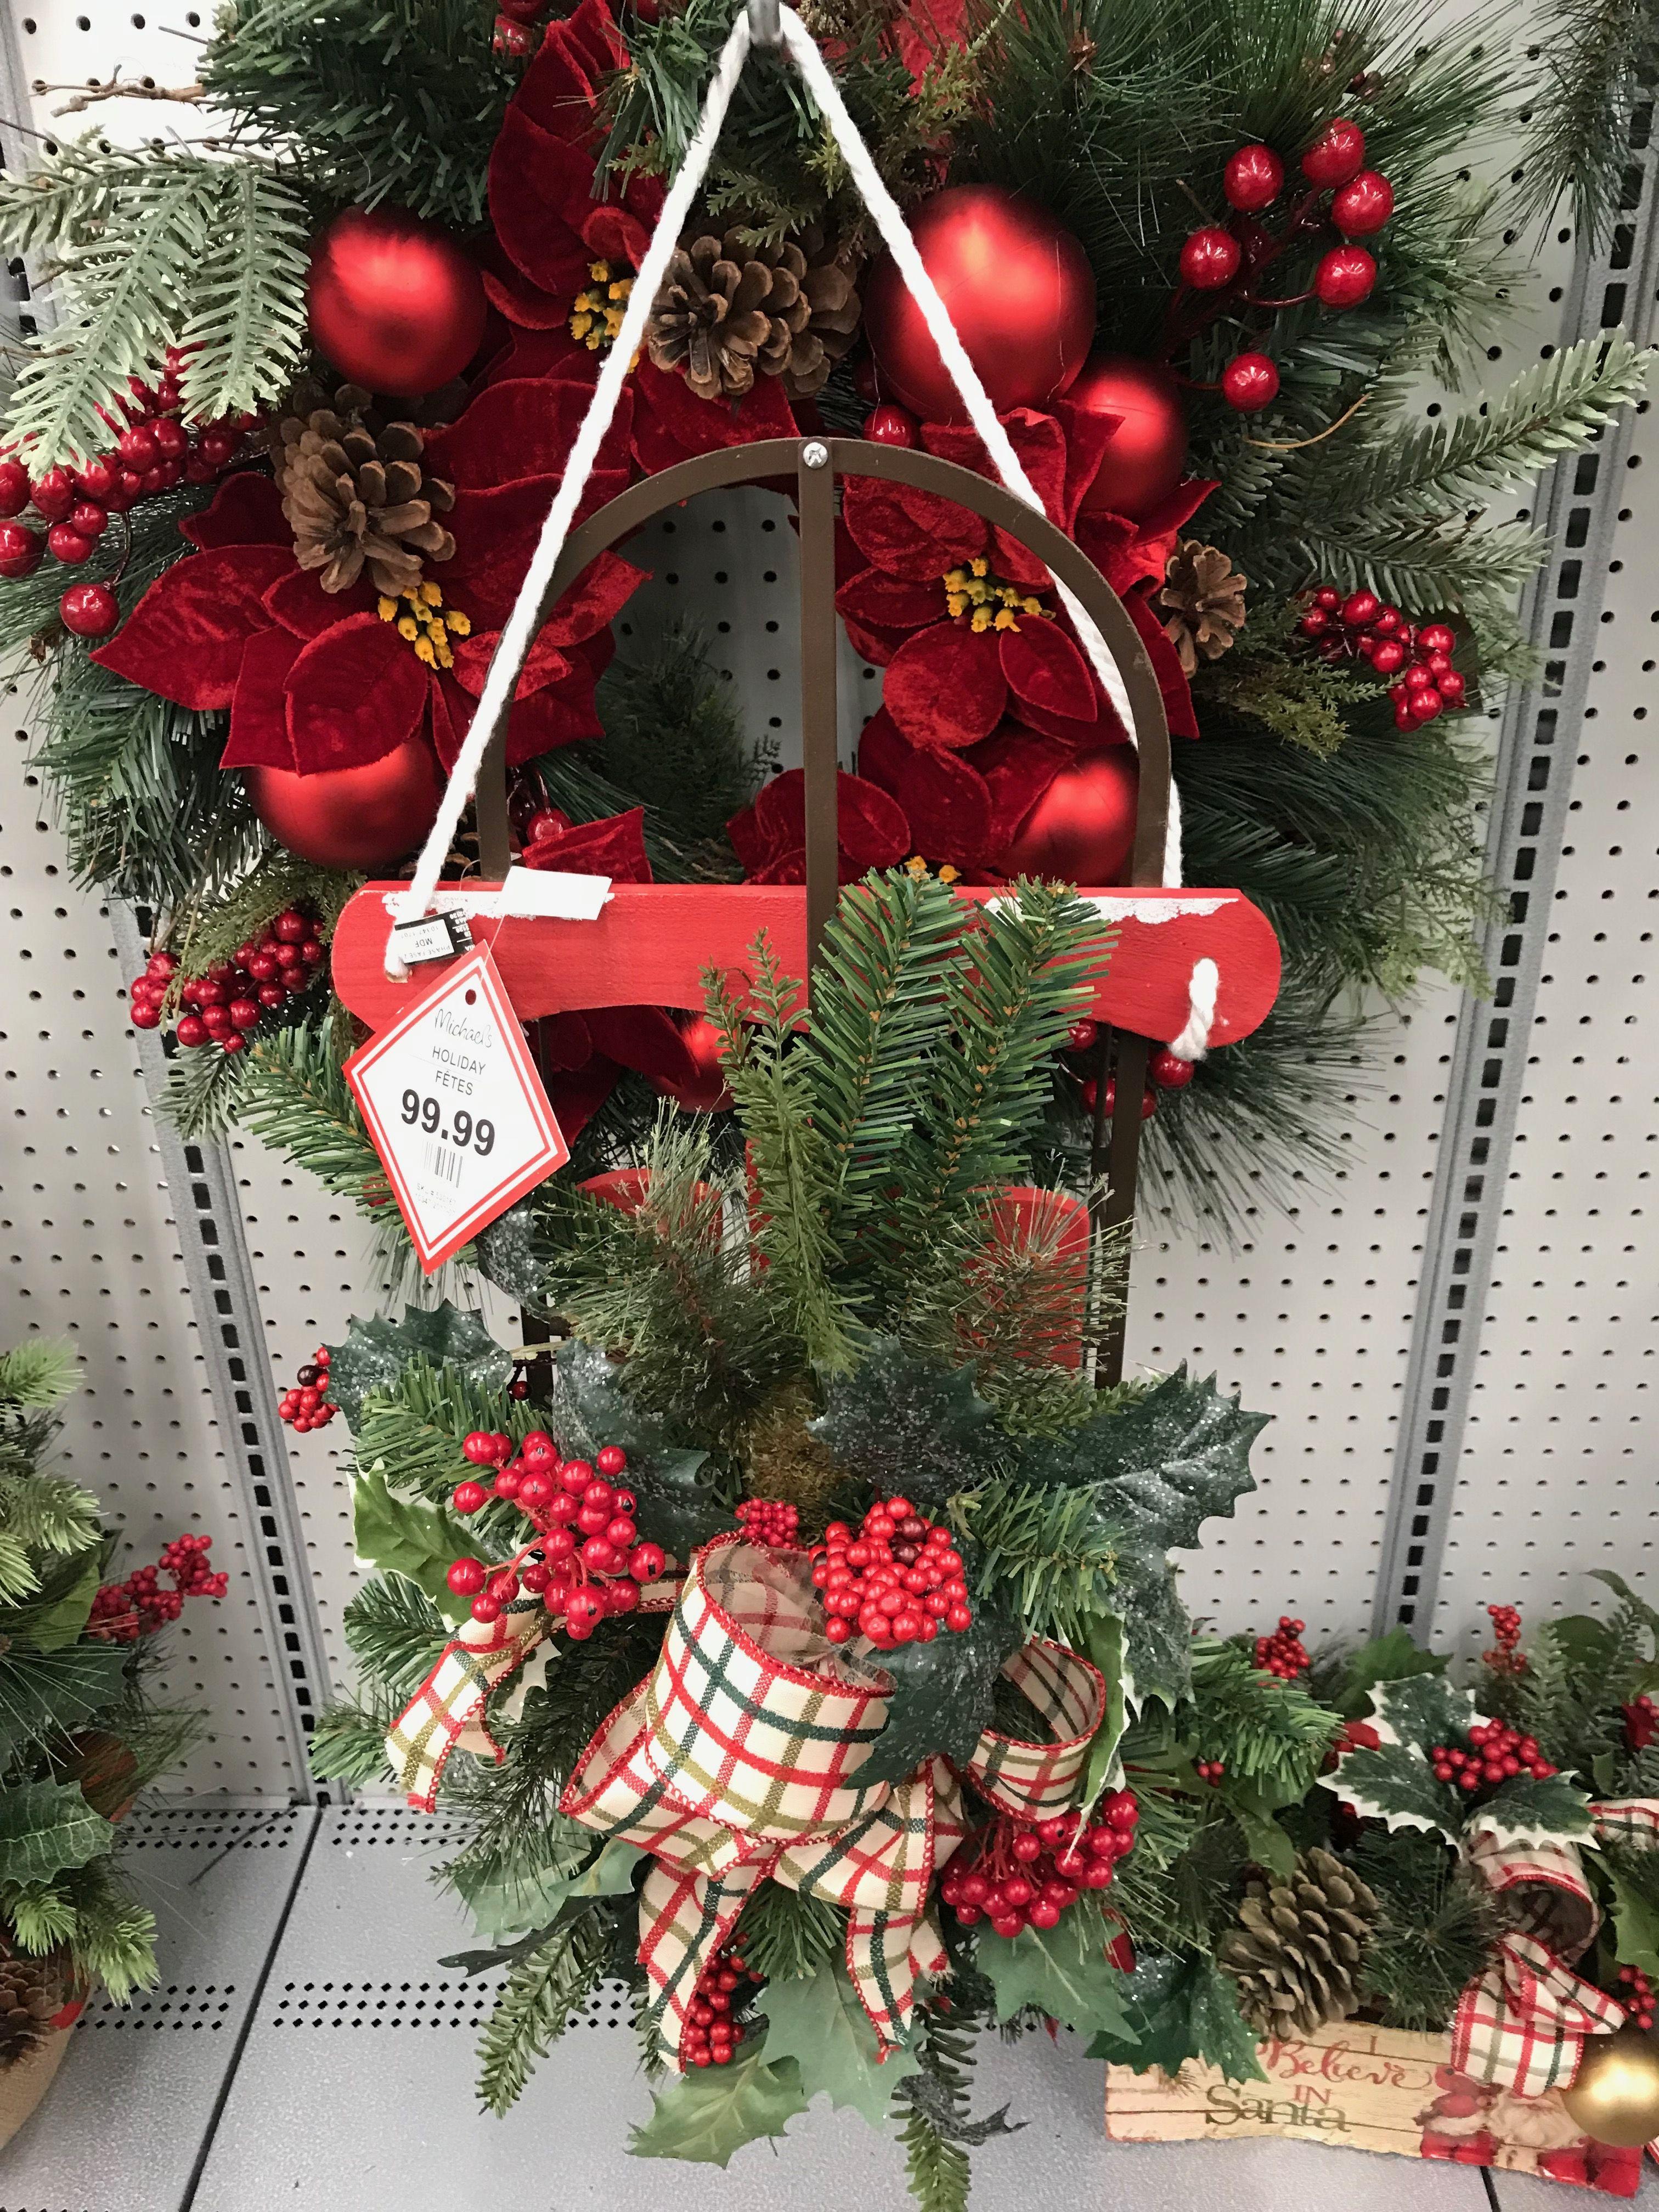 Pin by Pam B on Christmas   Pinterest